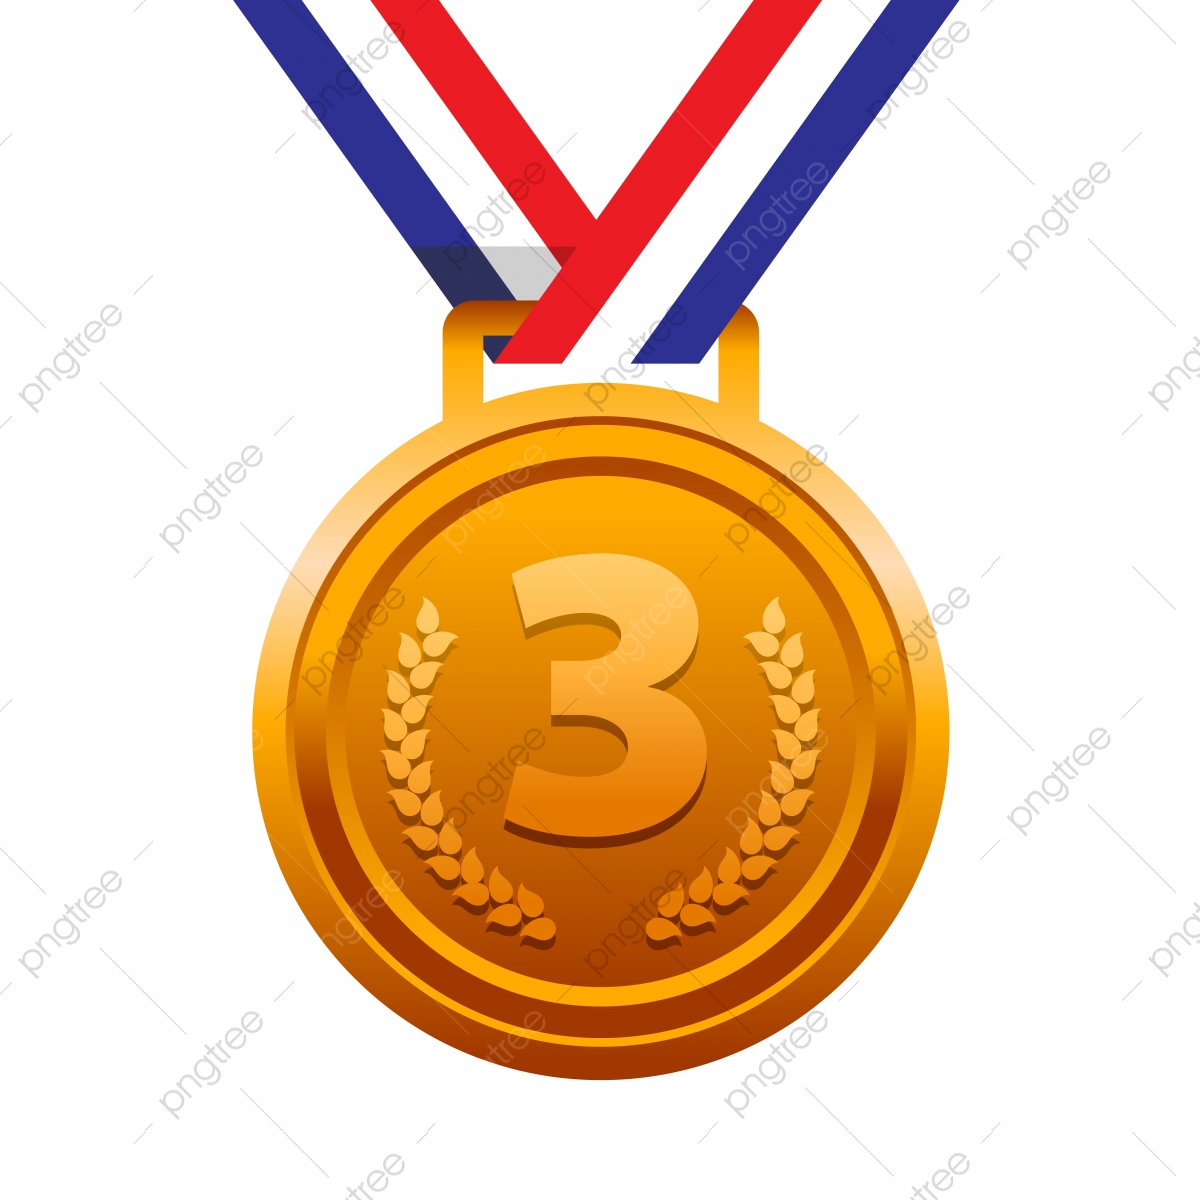 Third Place Bronze Medal For Sport Podium Winner, Achievement ...